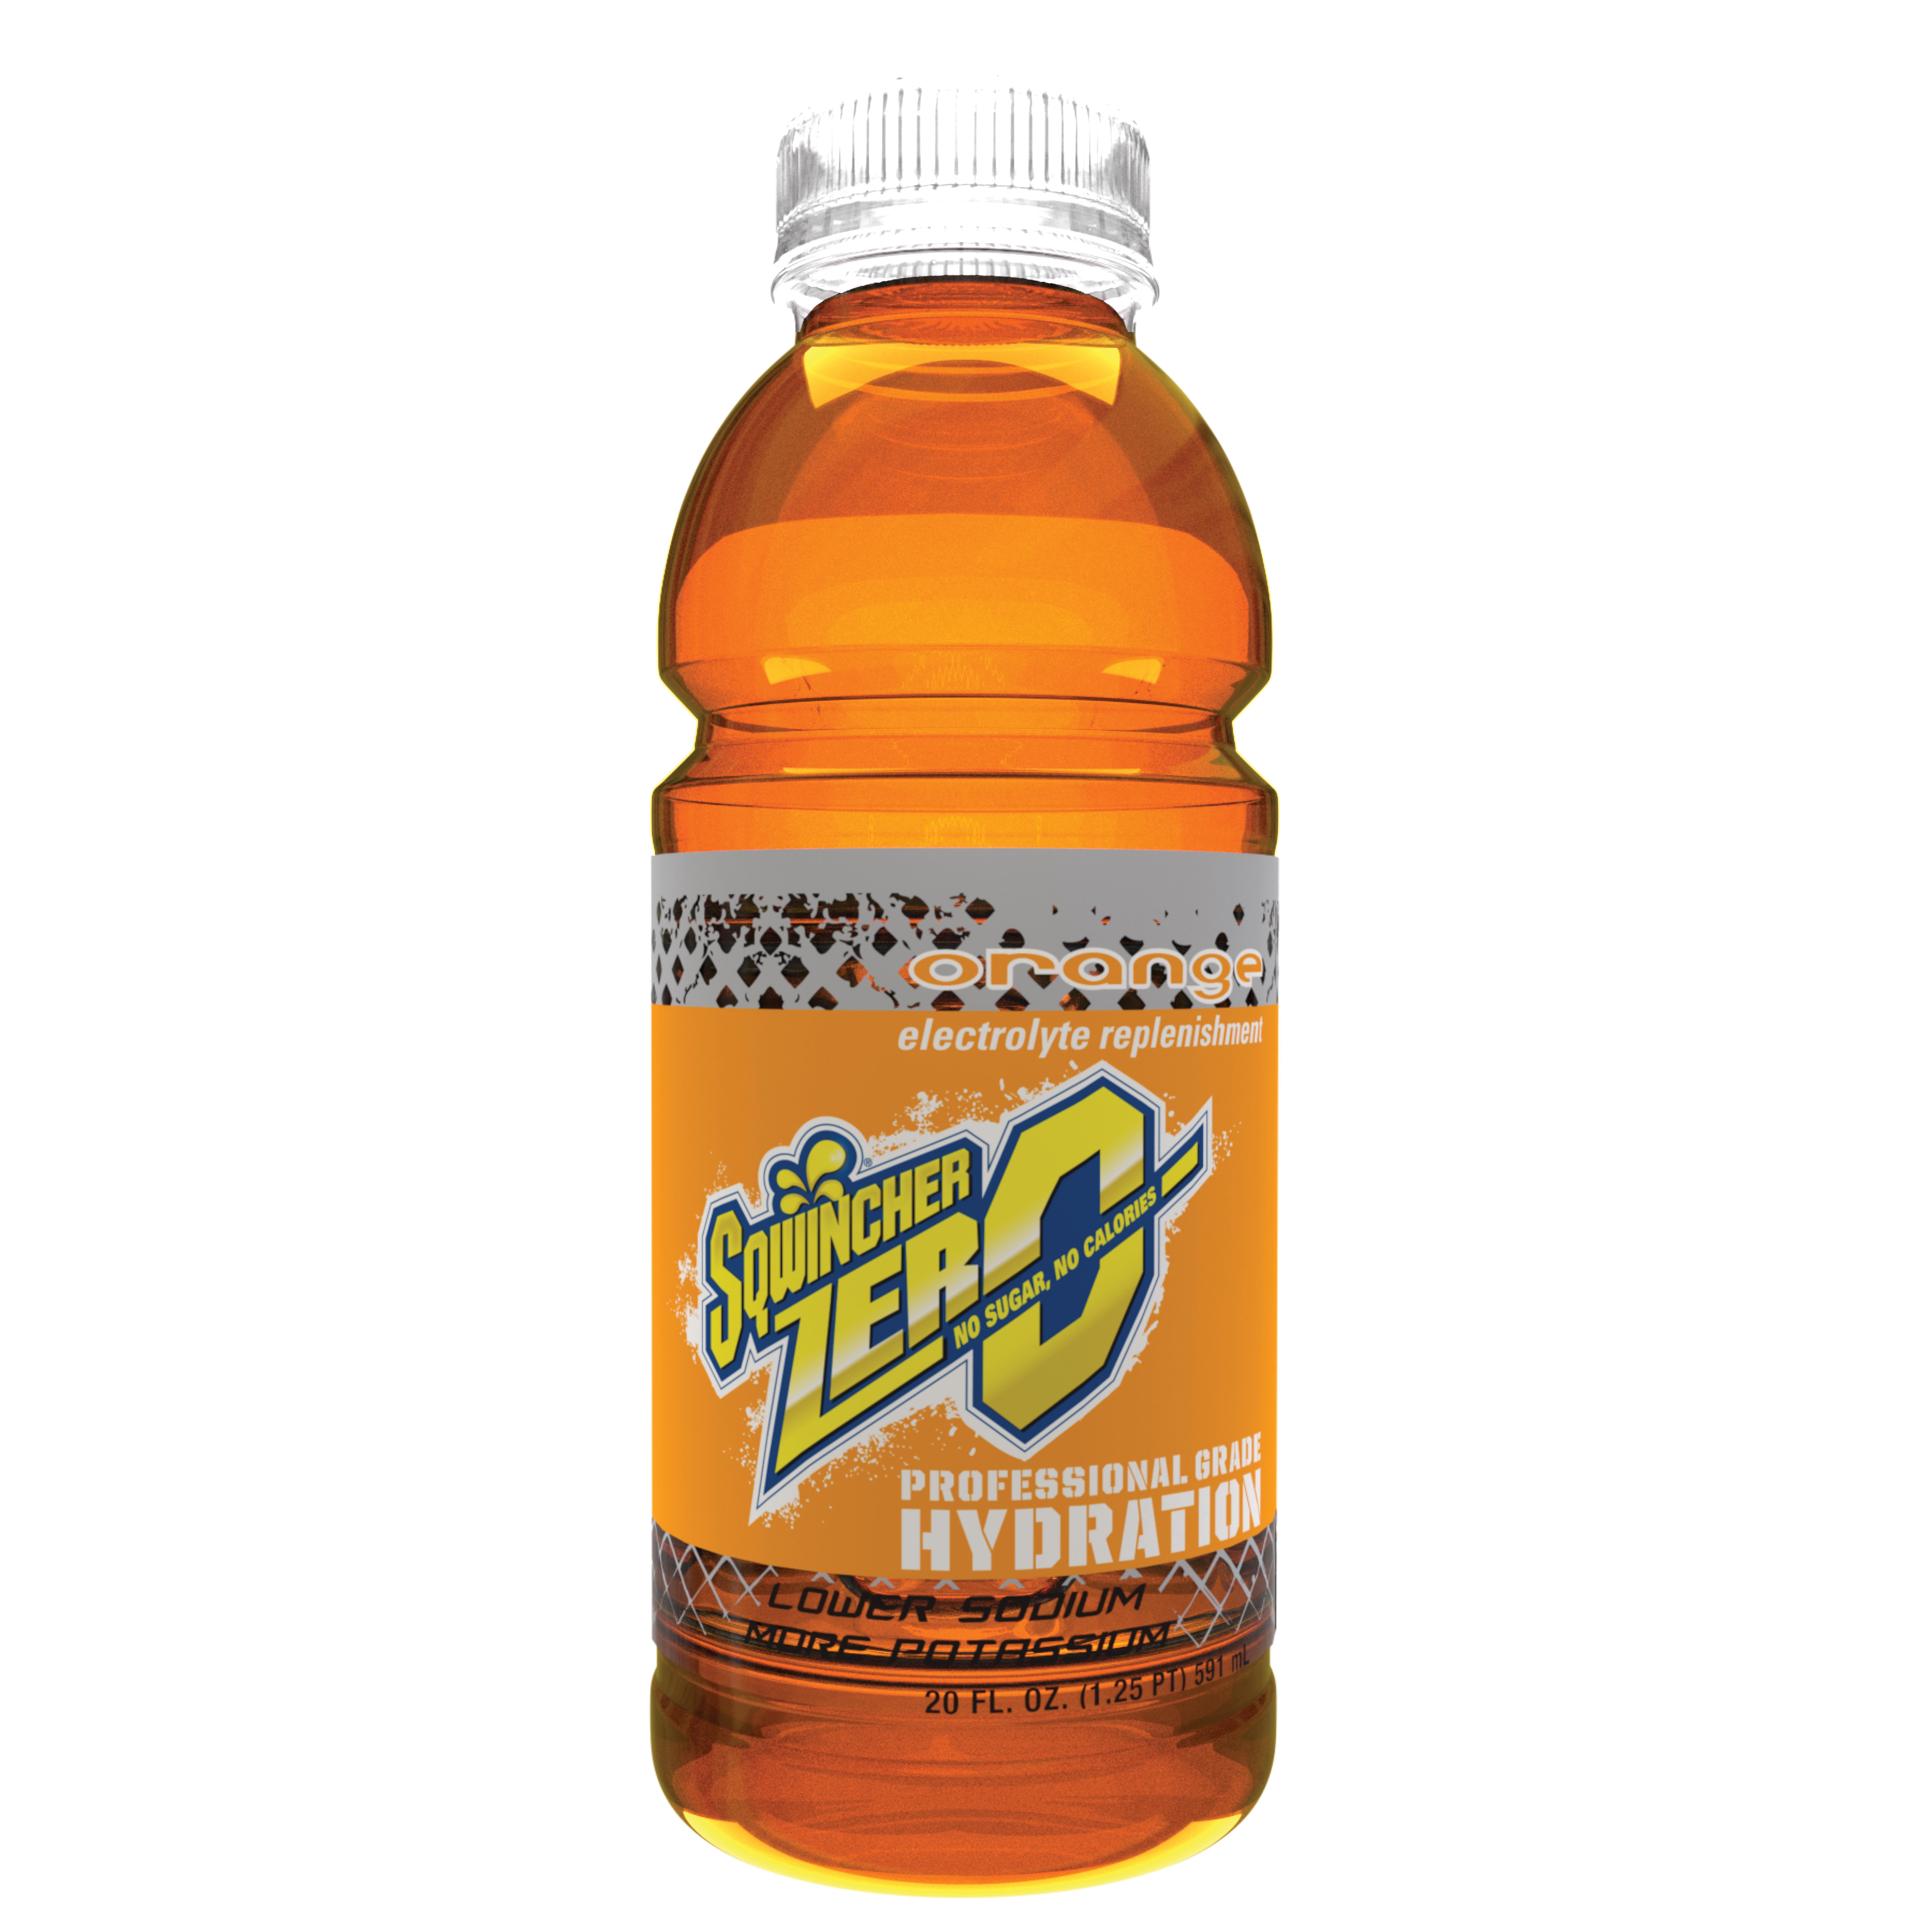 Sqwincher® 030801-OR Widemouth ZERO Sports Drink, 20 oz Ready-To-Drink Plastic Bottle, Liquid Form, Orange